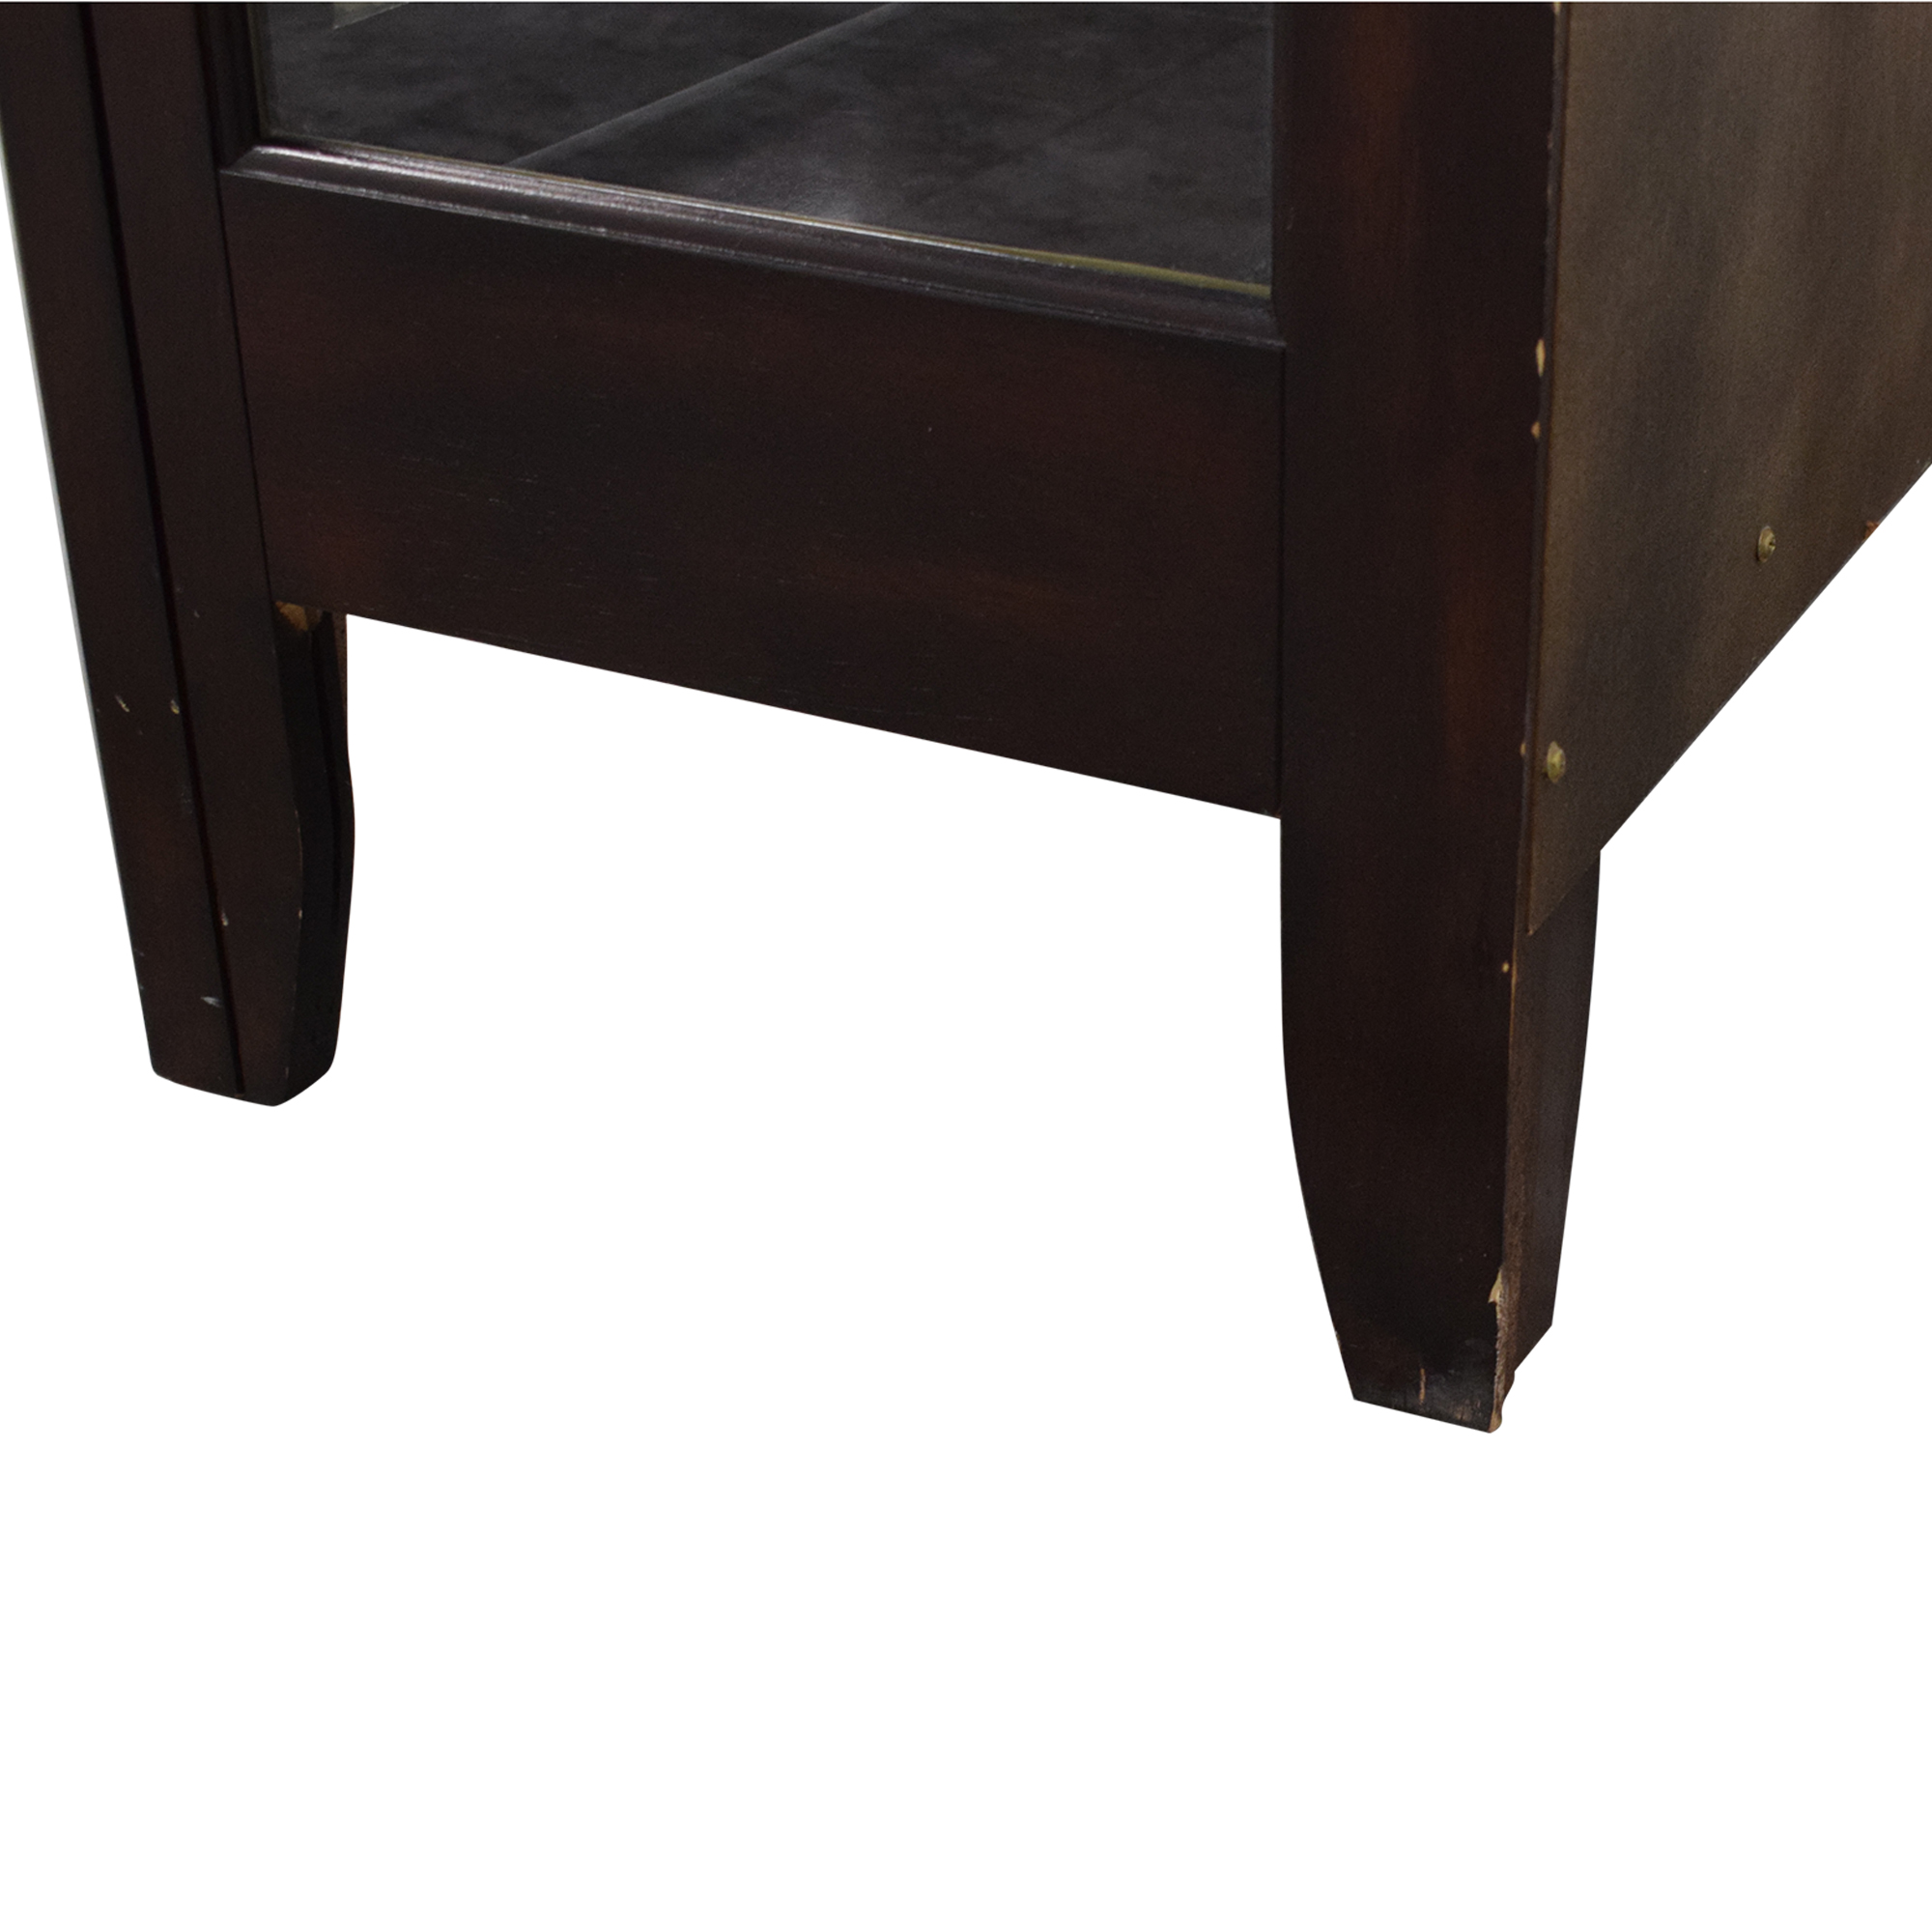 Raymour & Flanigan Buffet Table / Storage